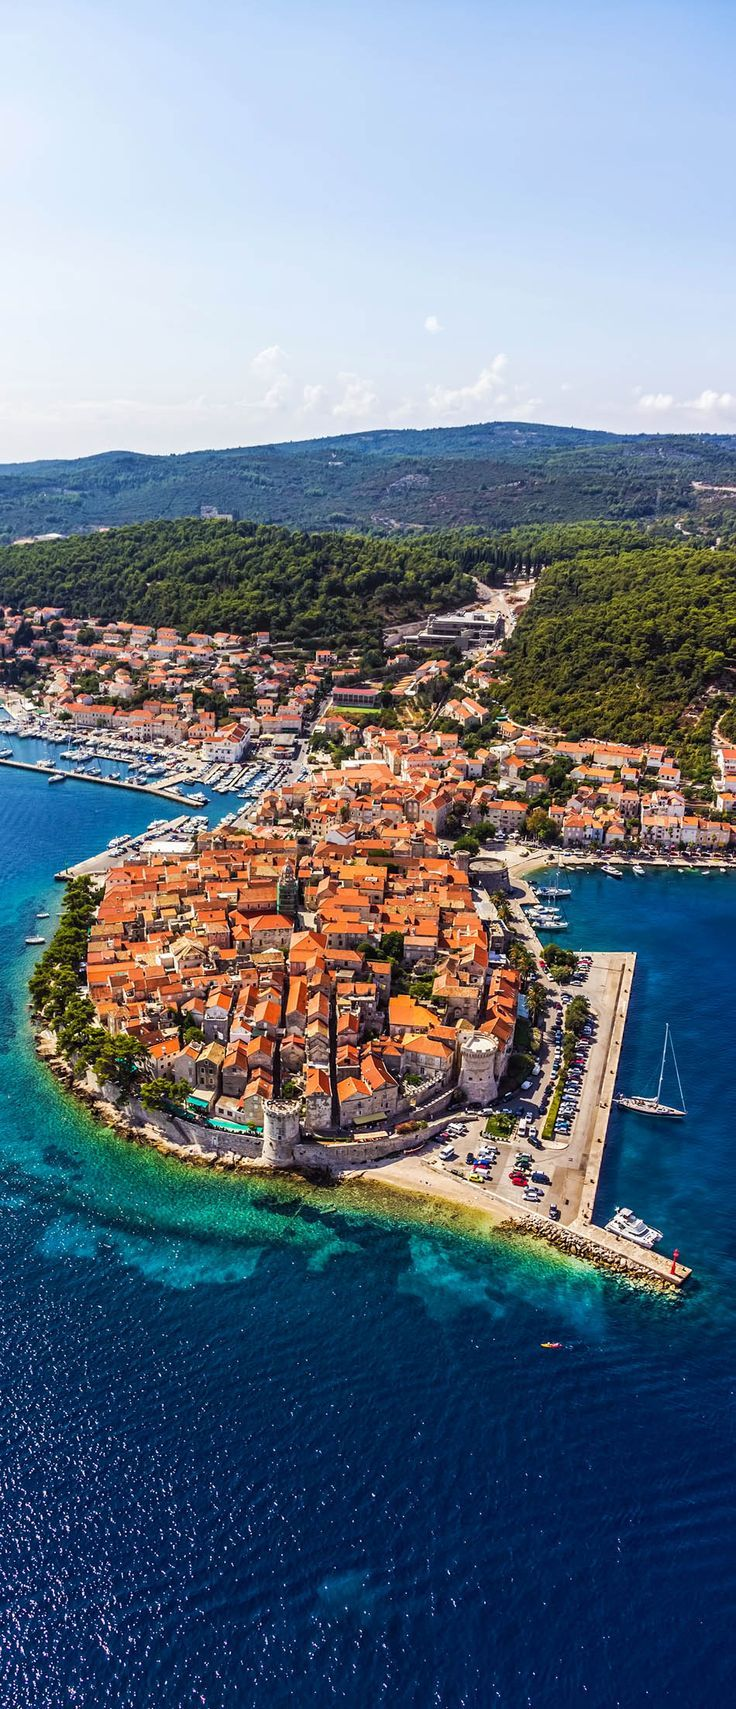 VAGABONDING BLOG /// VINJABOND Places to travel, Croatia